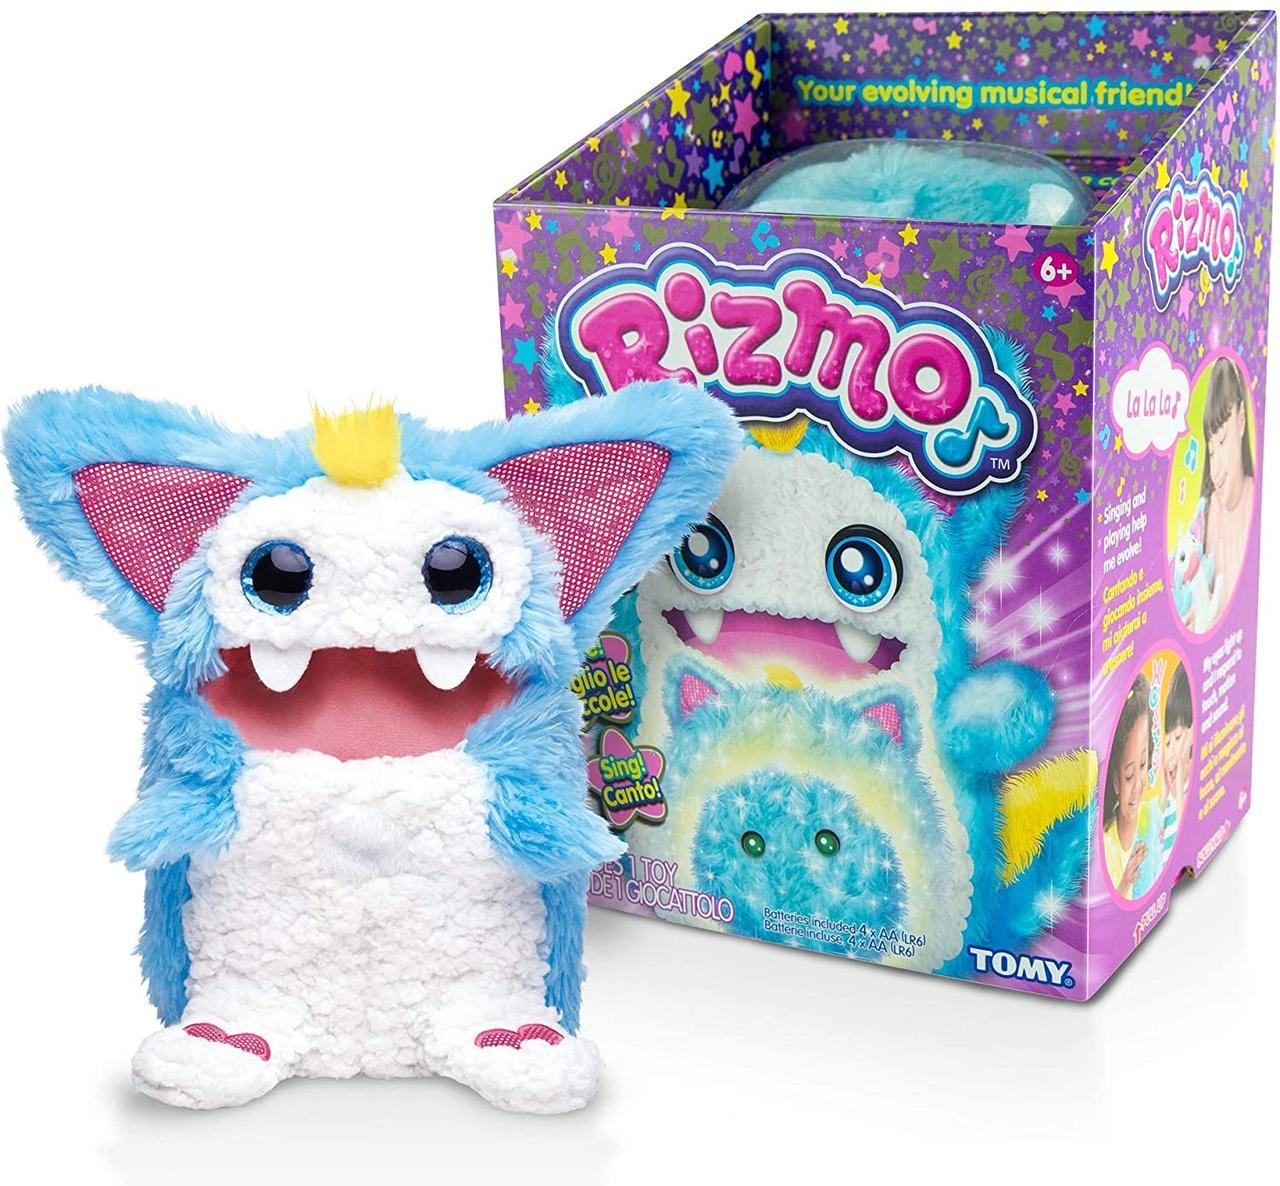 Ризмо інтерактивний музичний вихованець блакитний Rizmo Evolving Musical Friend Interactive Plush Toy, Aqua